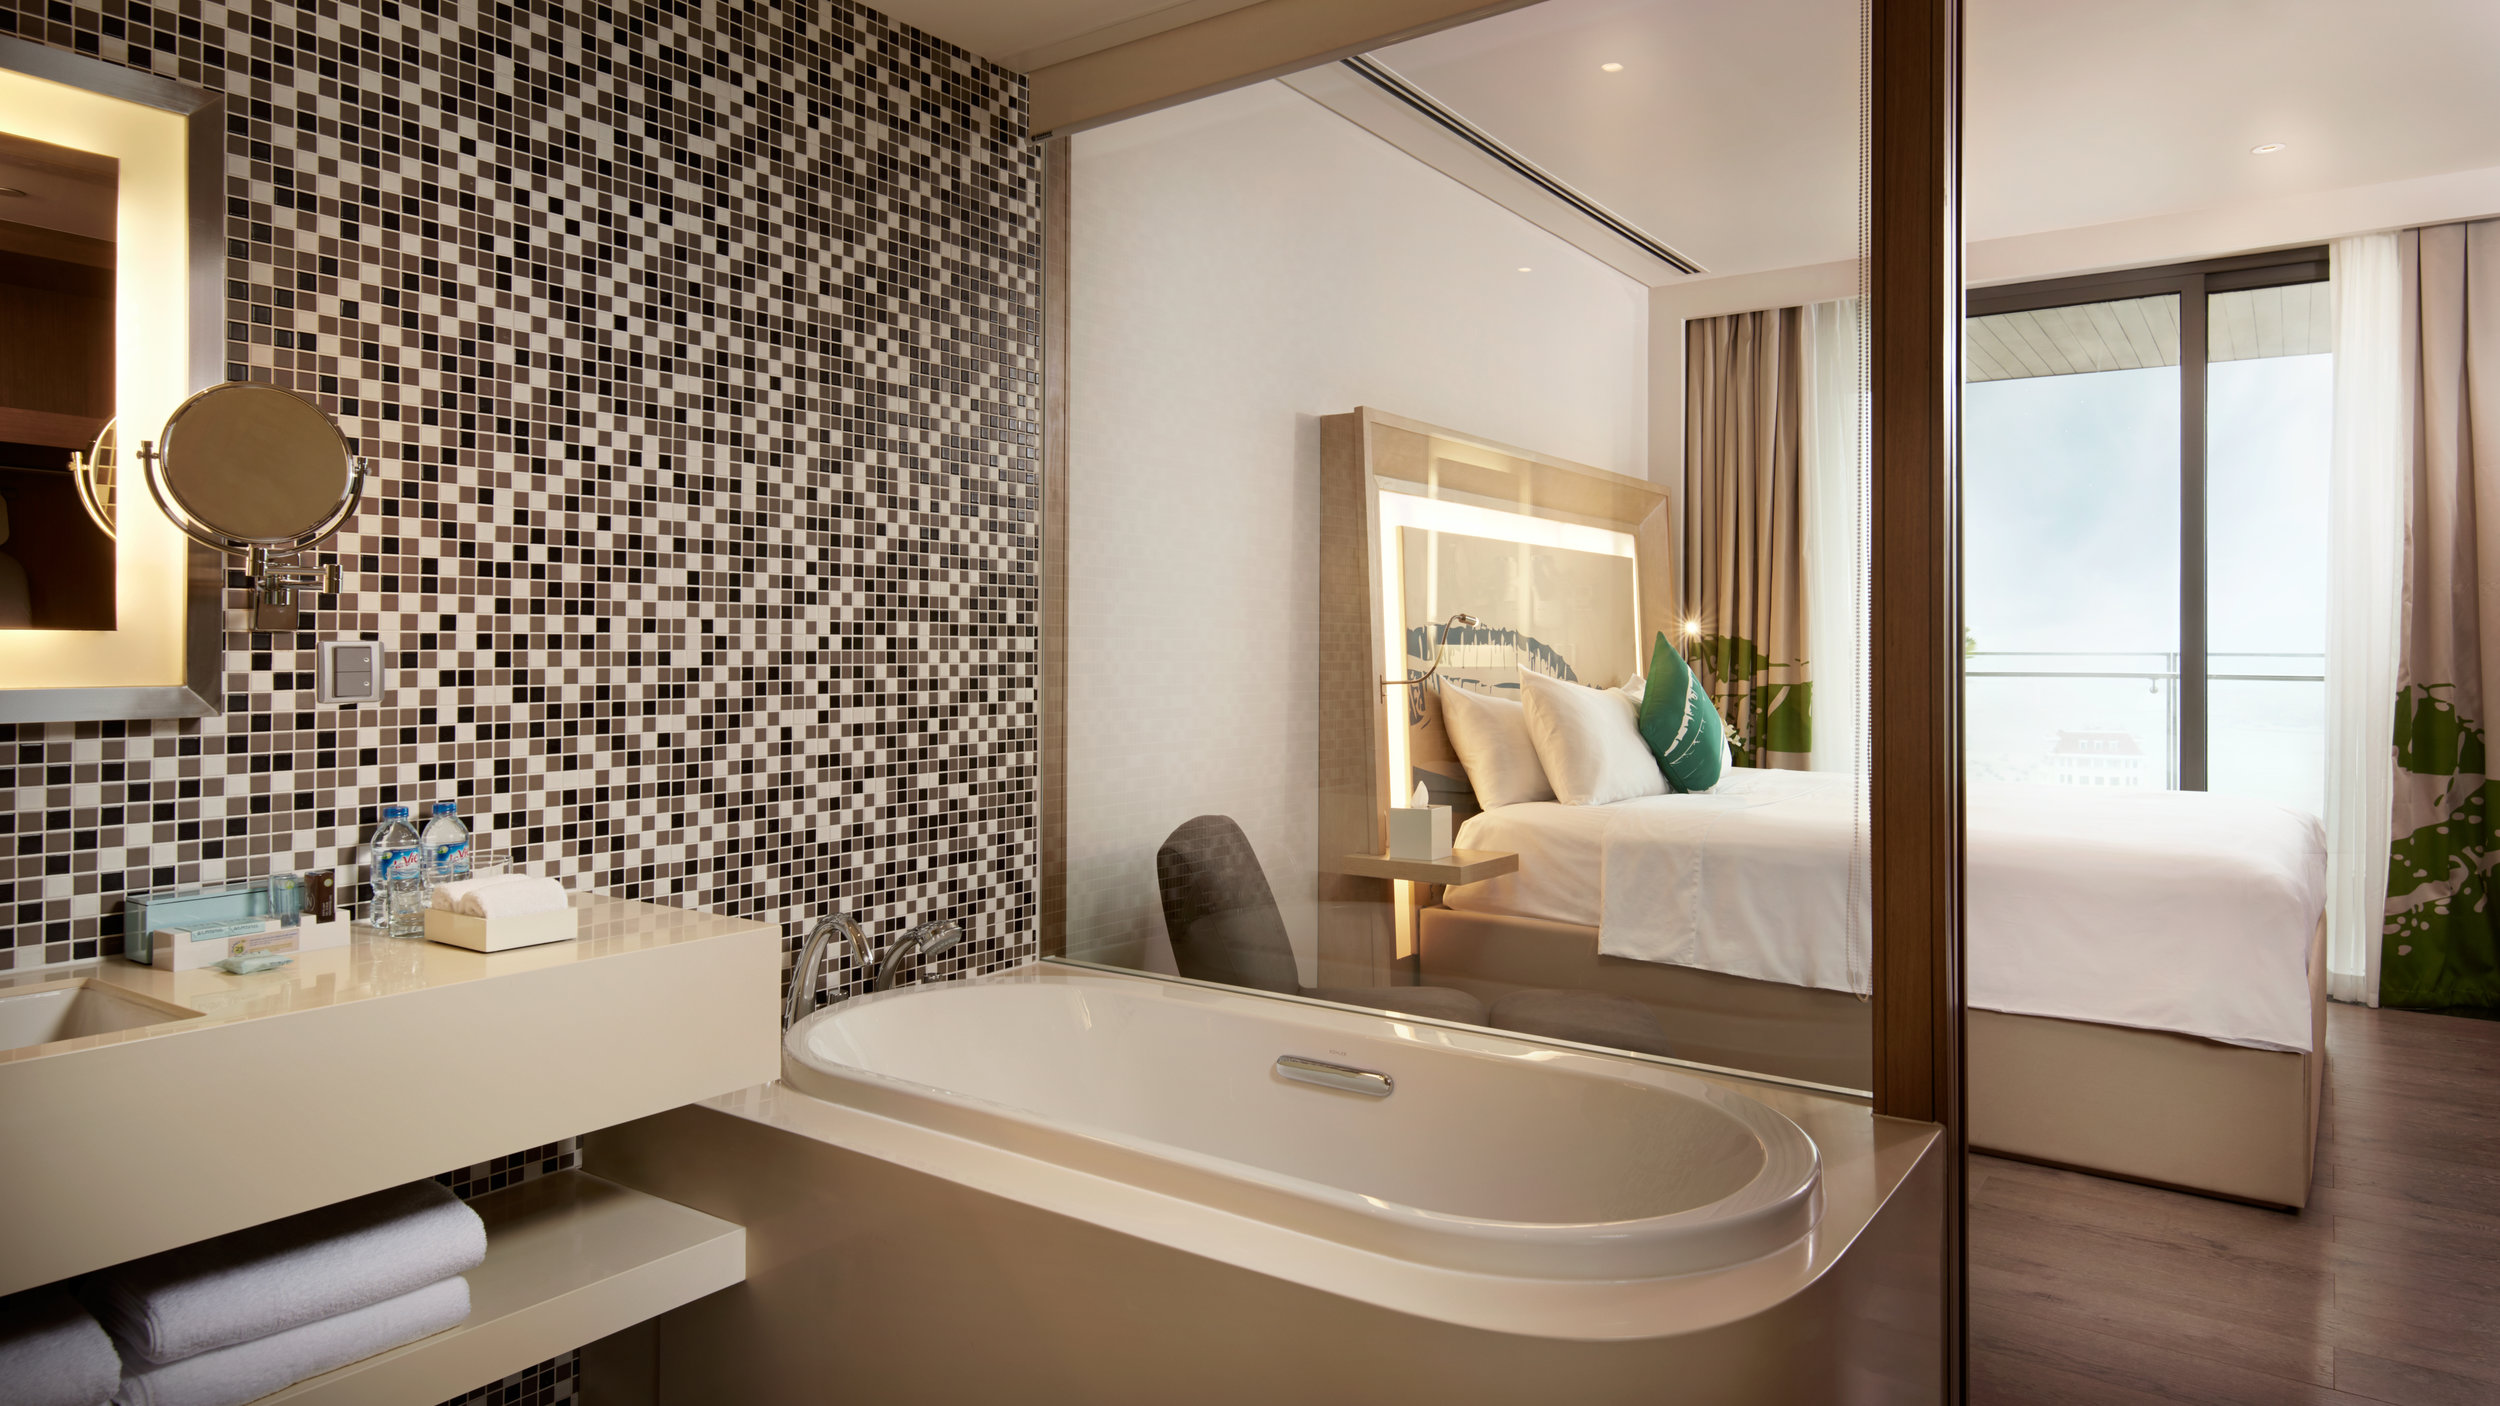 Novotel-Bedroom.jpg